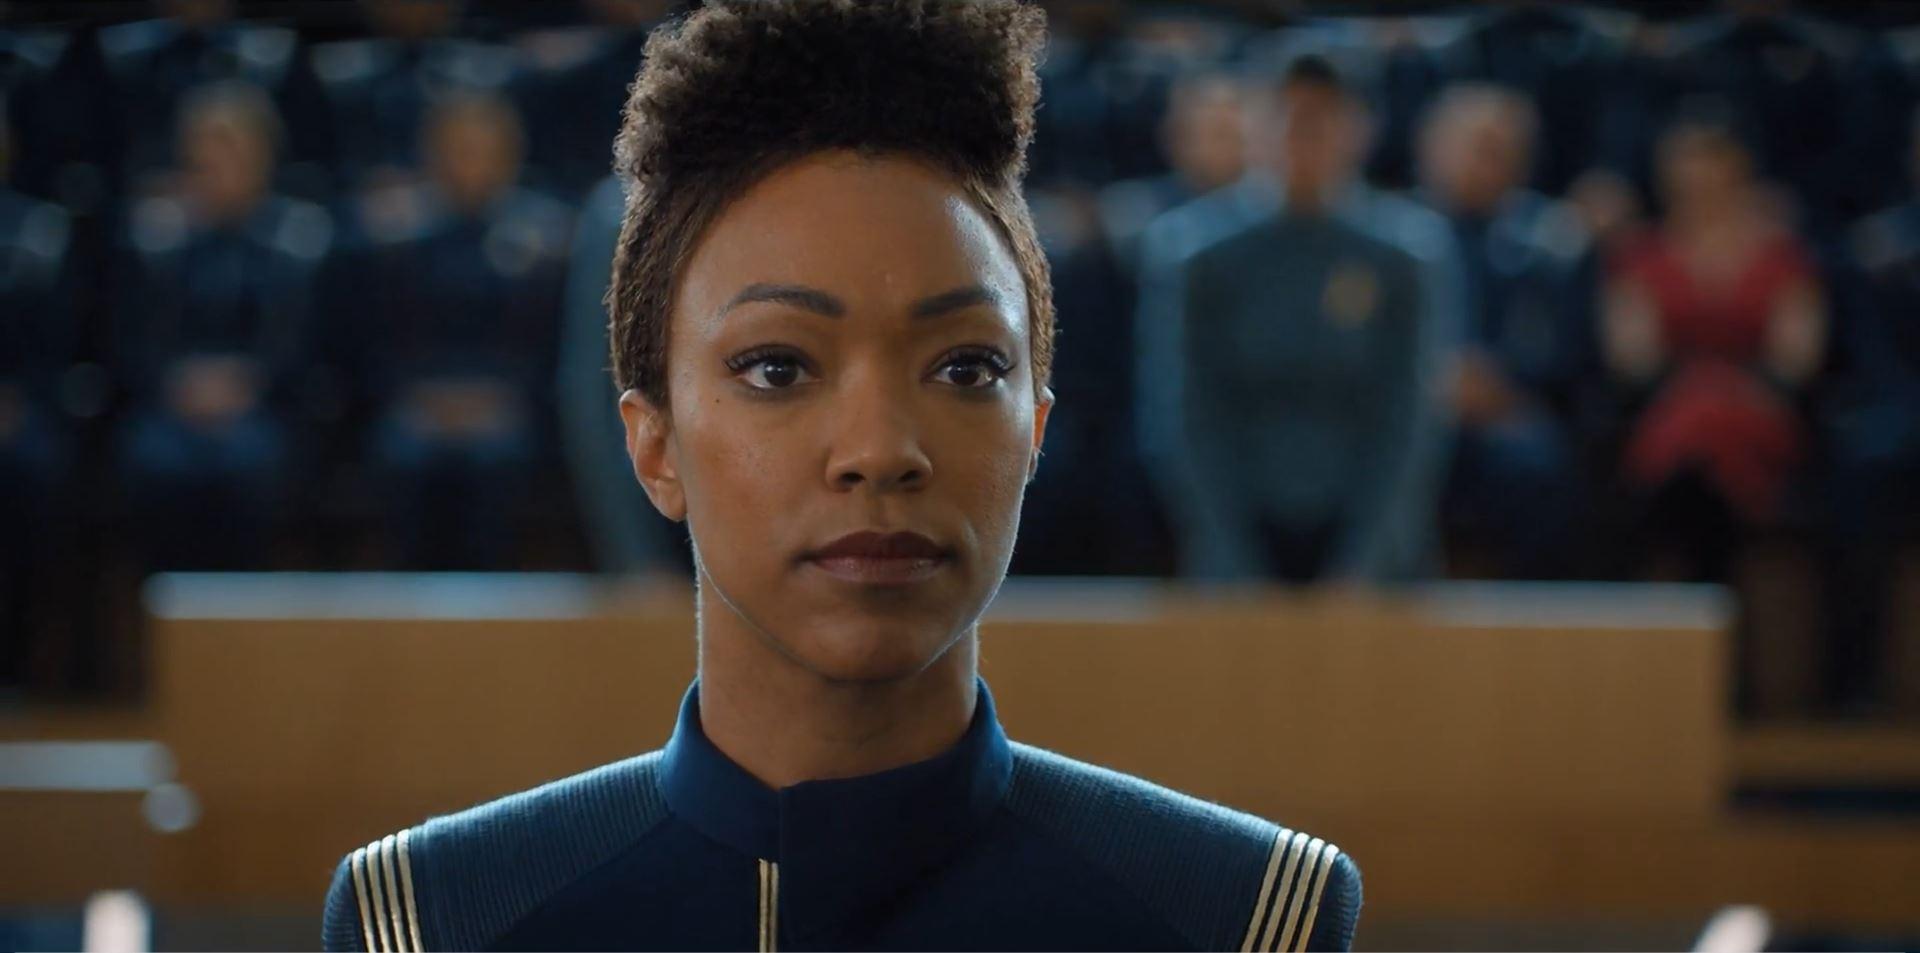 Star Trek Discovery - Burnham speec (Sonequa Martin Green)